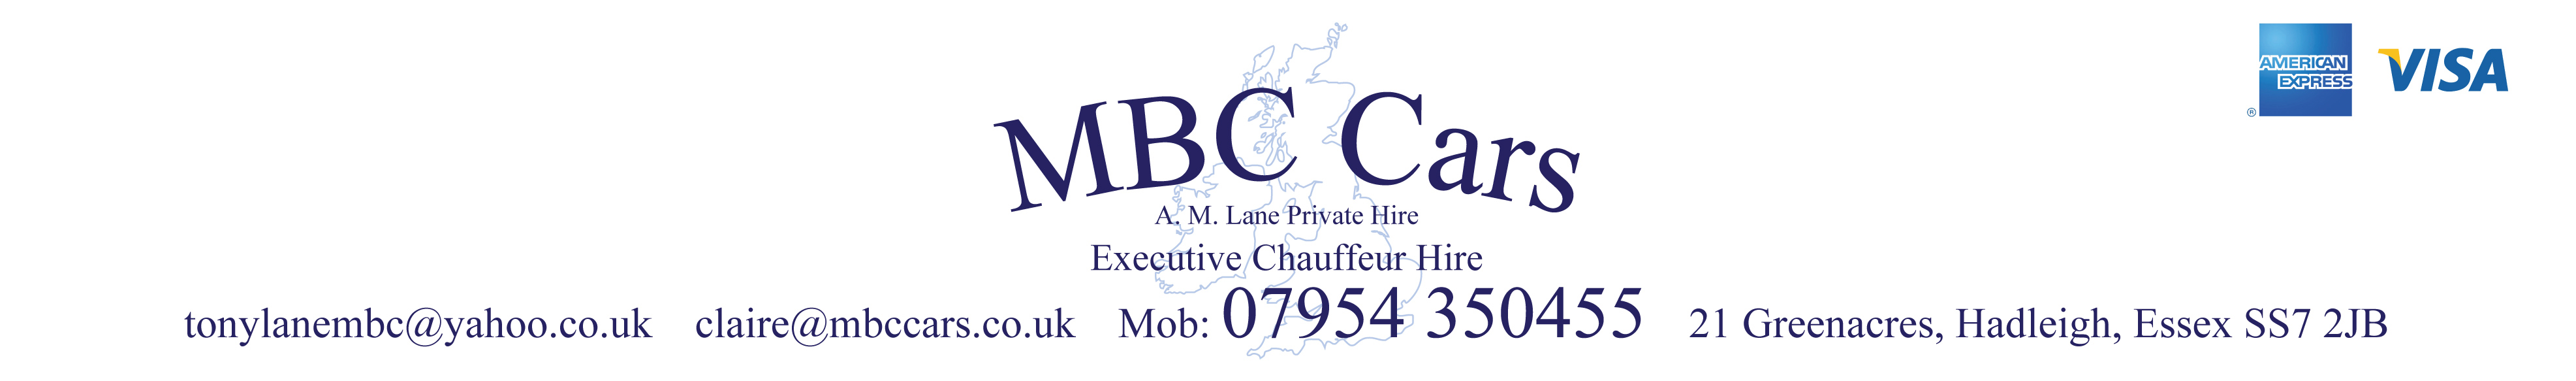 MBC Cars